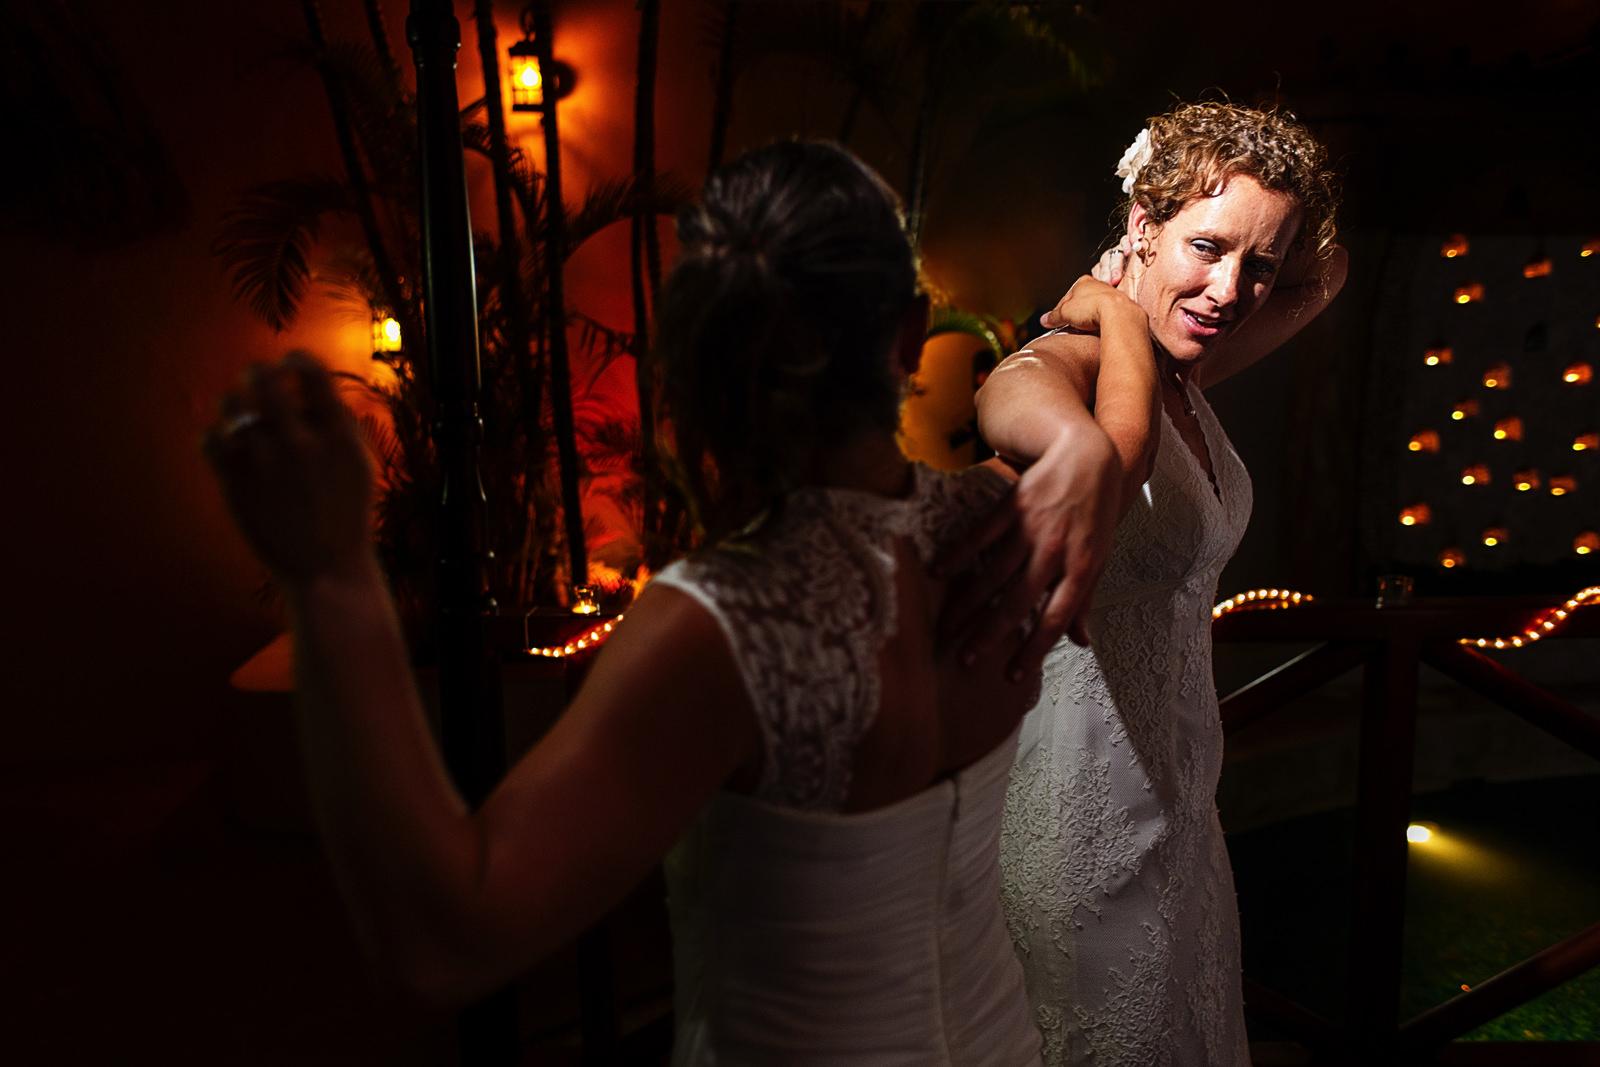 lesbian_couple_dancing_party